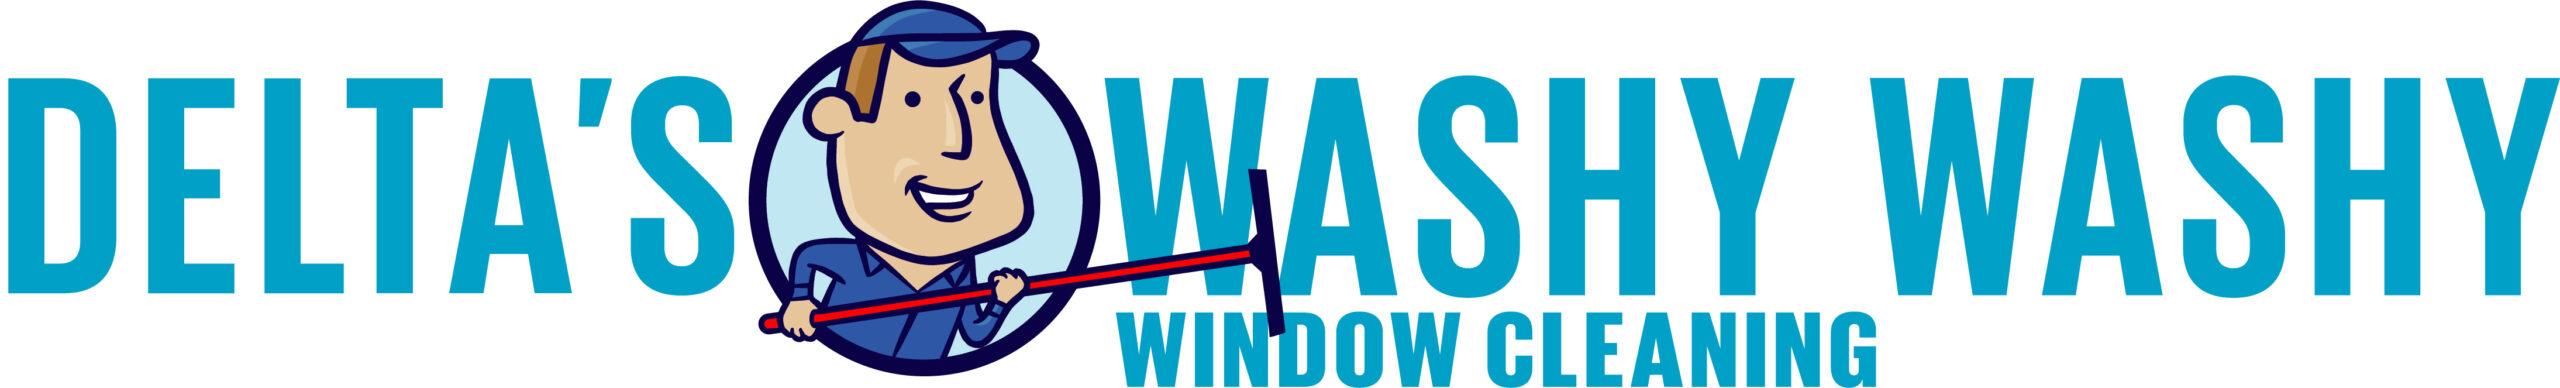 Washy Washy Window Cleaning Company